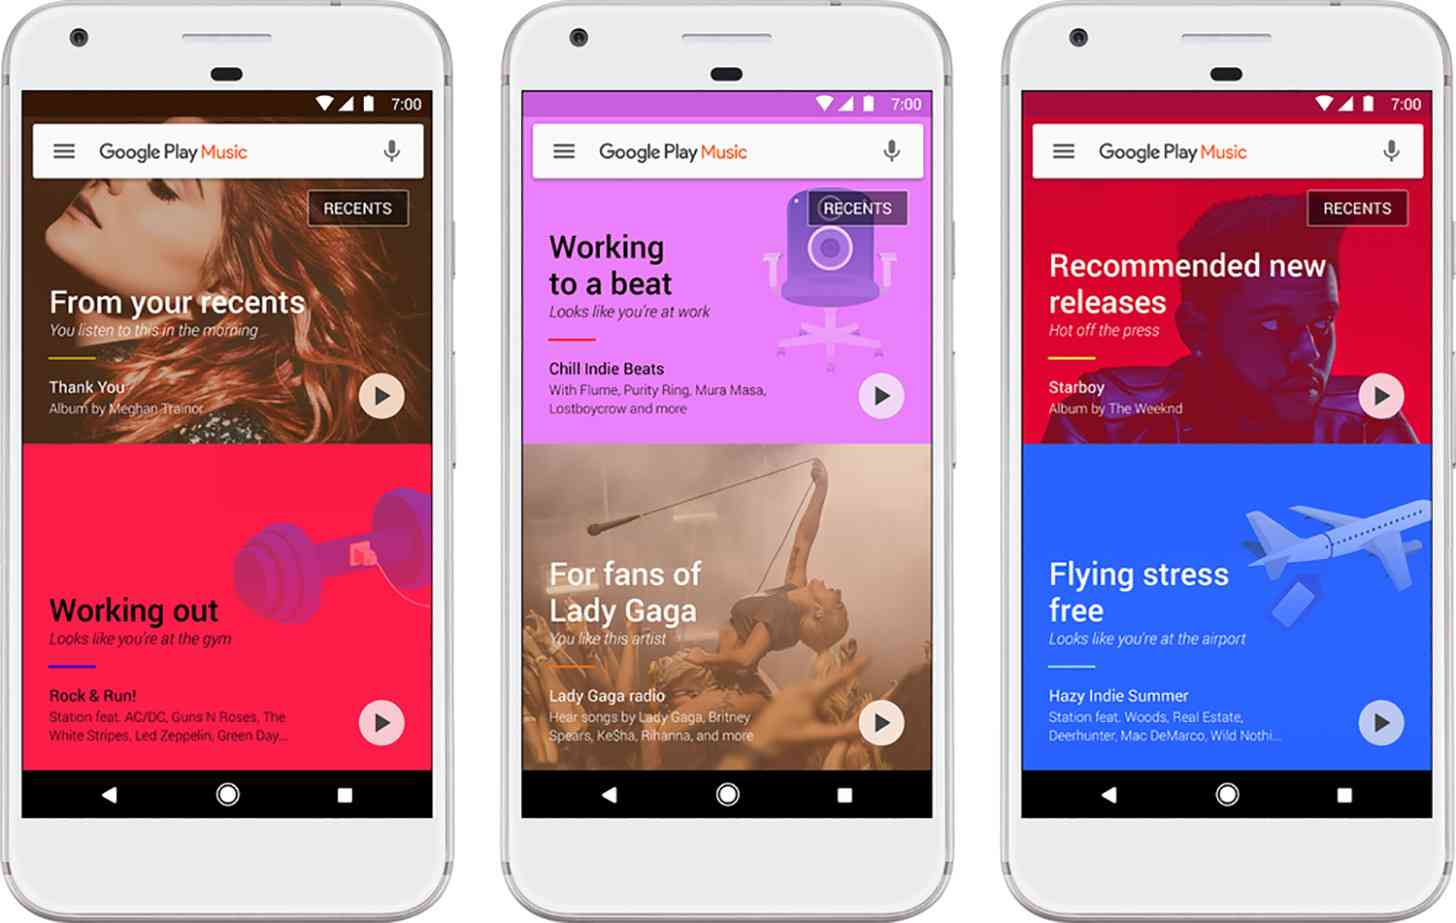 Google Play Music update new home screen